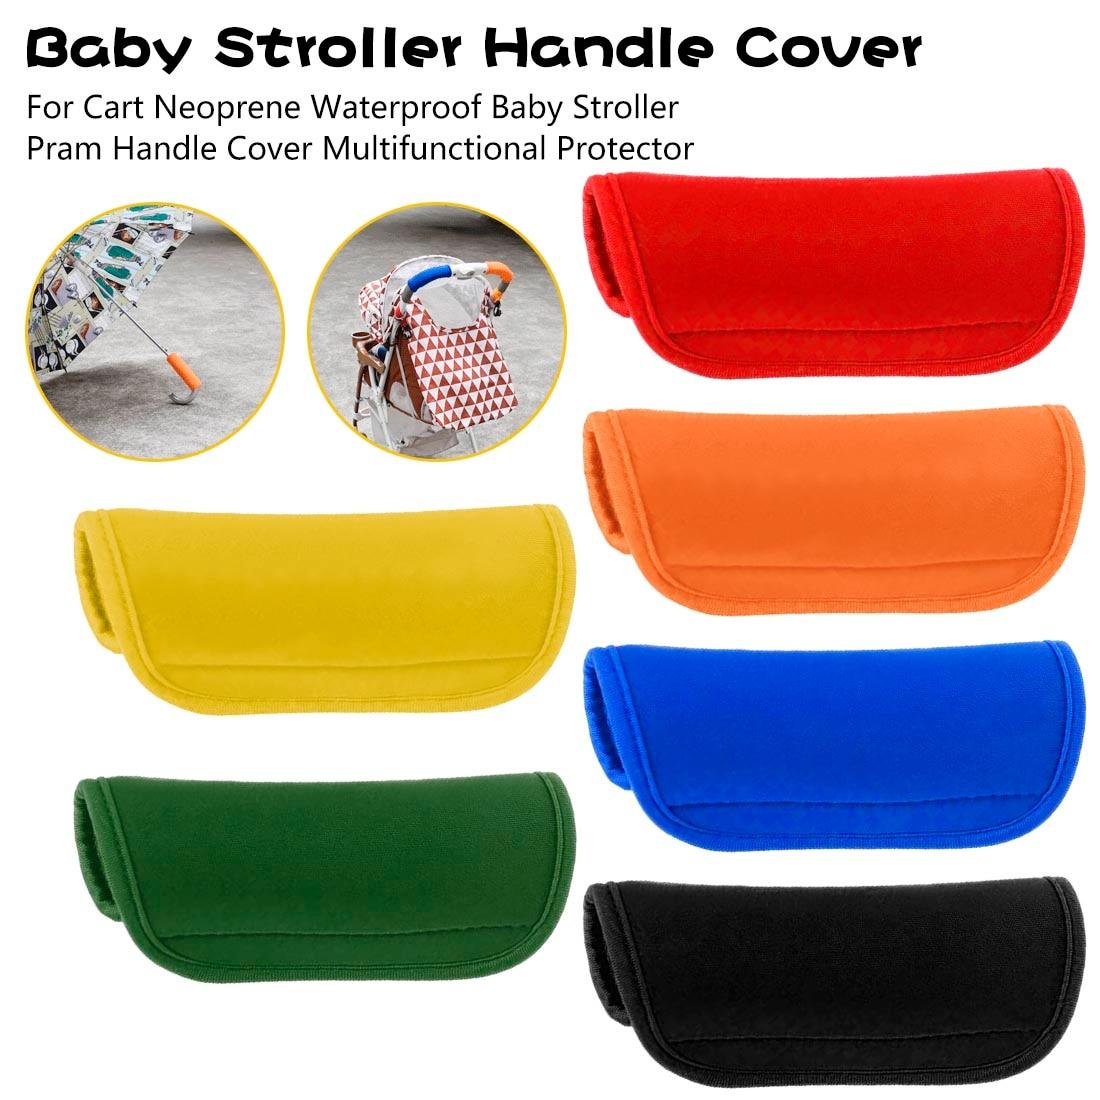 Waterproof 1pcs Baby Stroller Handle Cover For Pram Cart Multifunctional Protector Neoprene Stroller Accessories